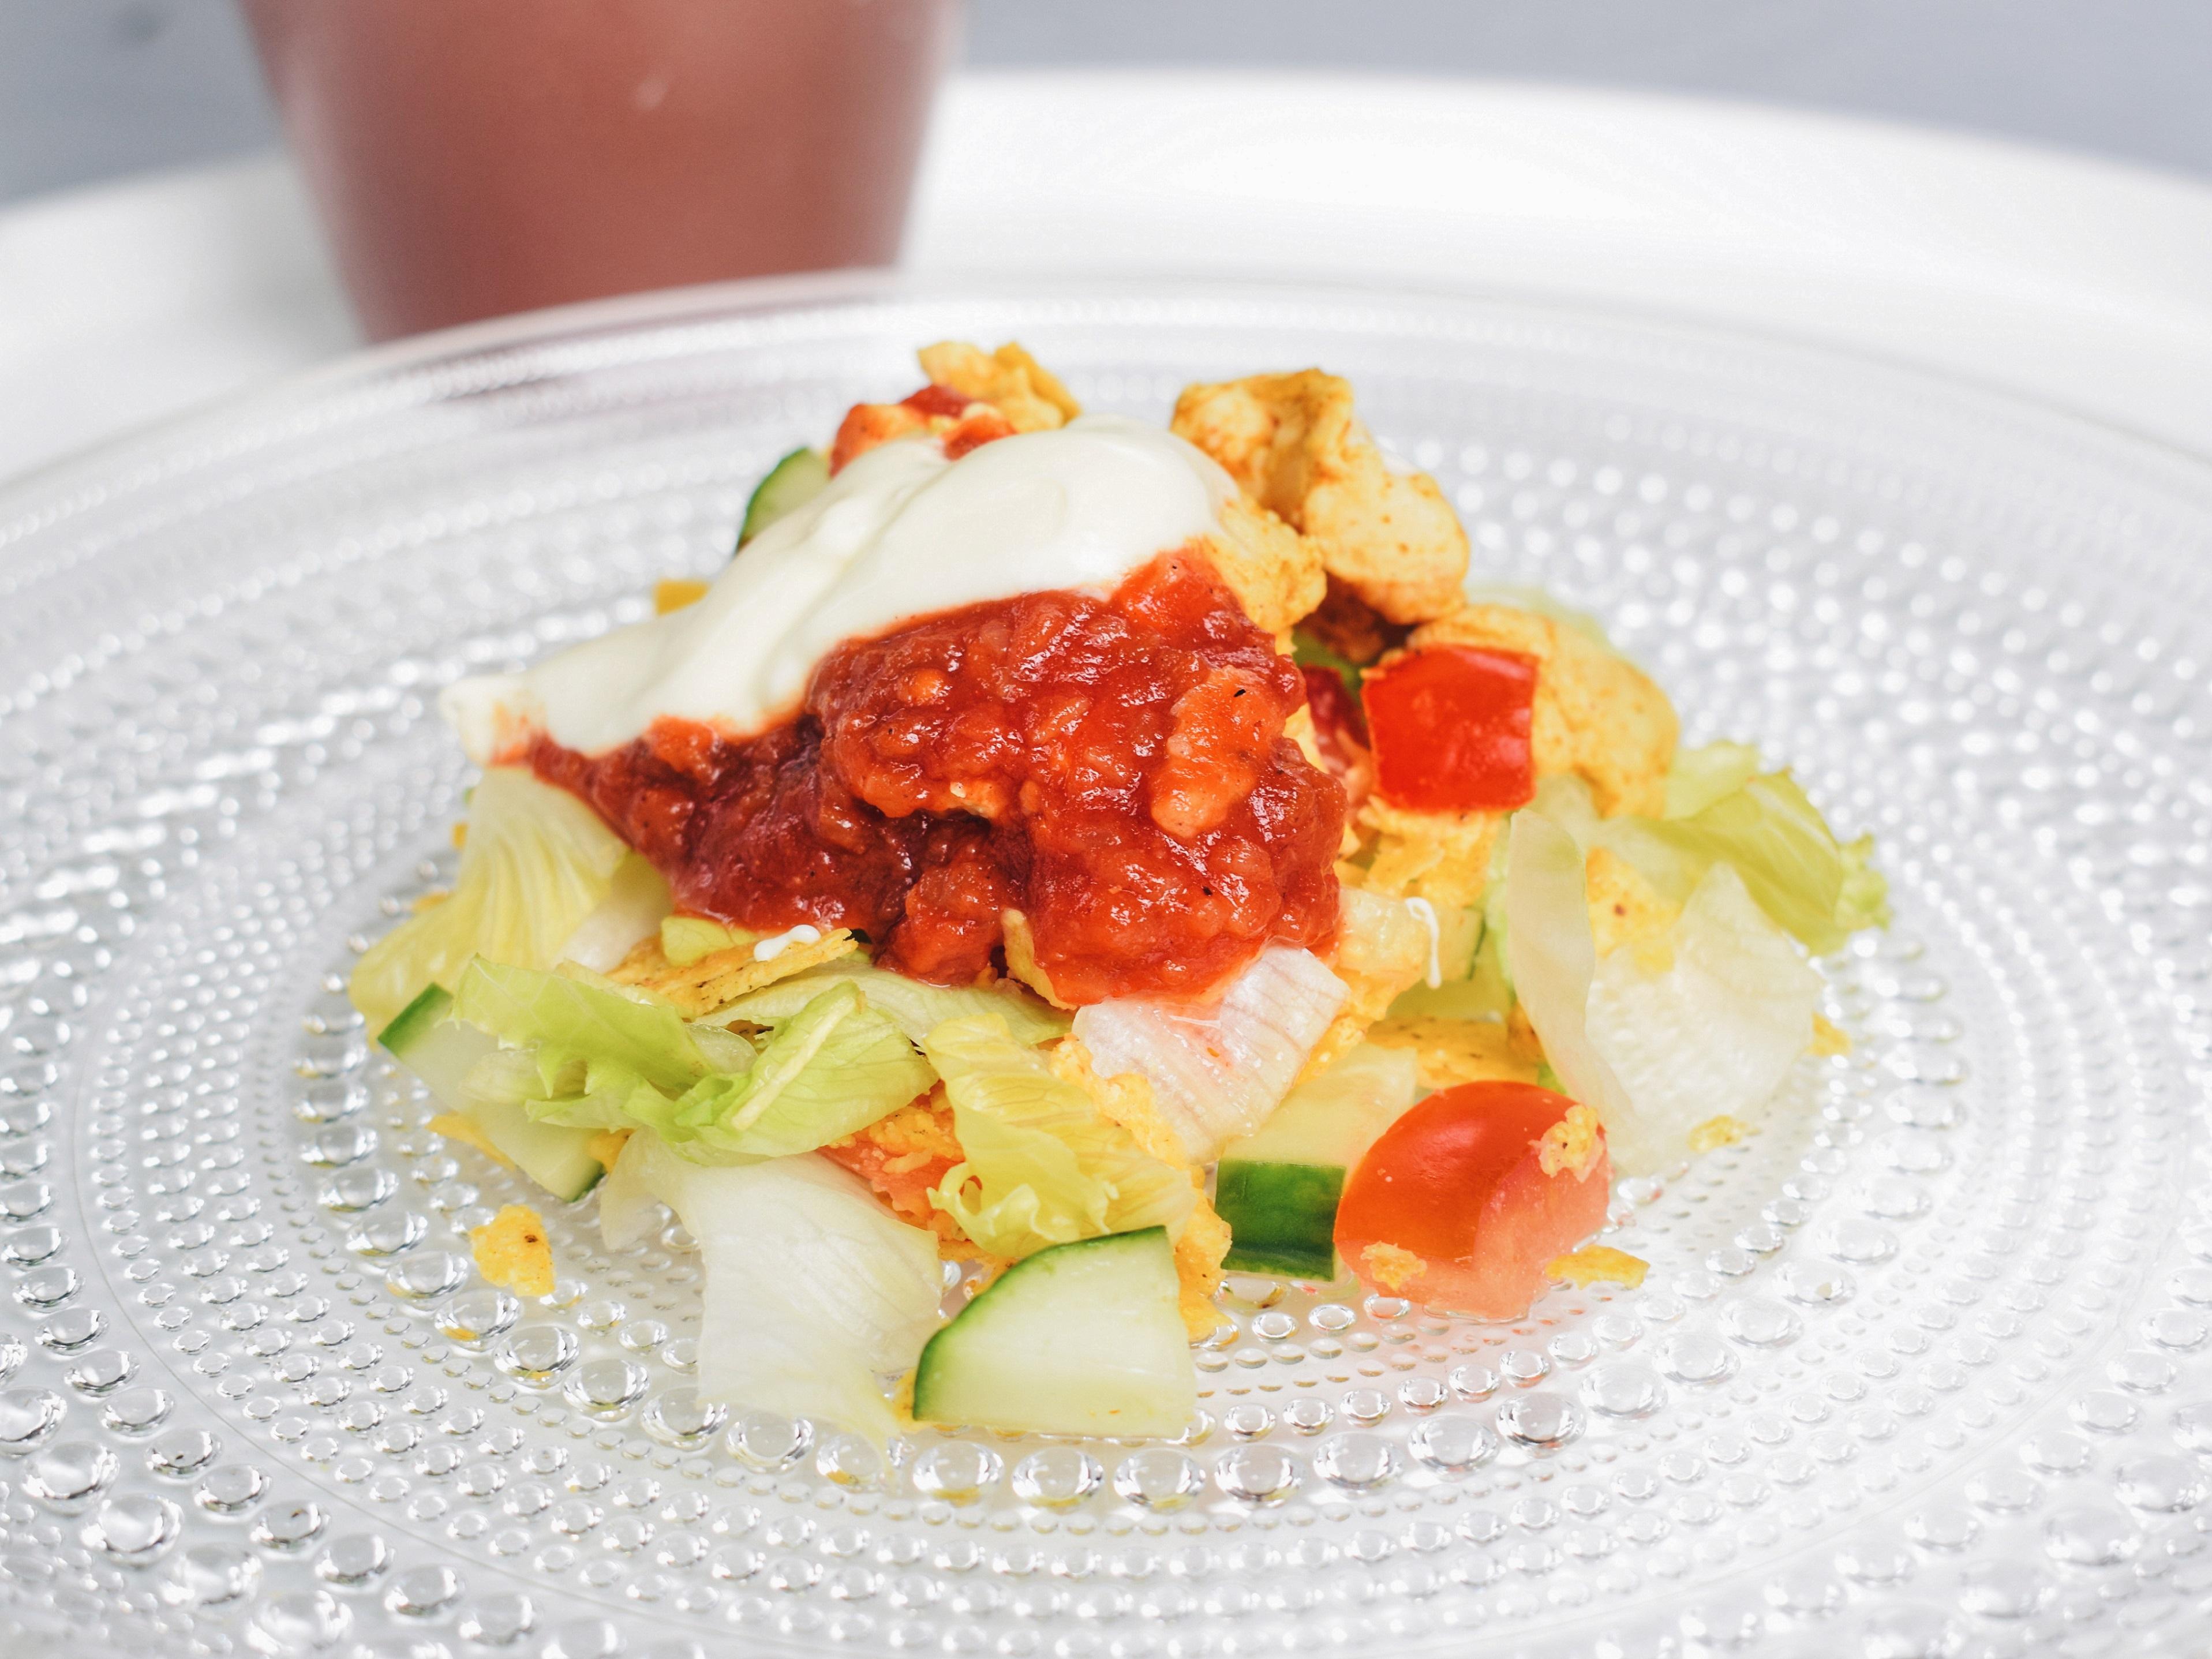 Outlandish blog photography challenge regrets food chicken salad